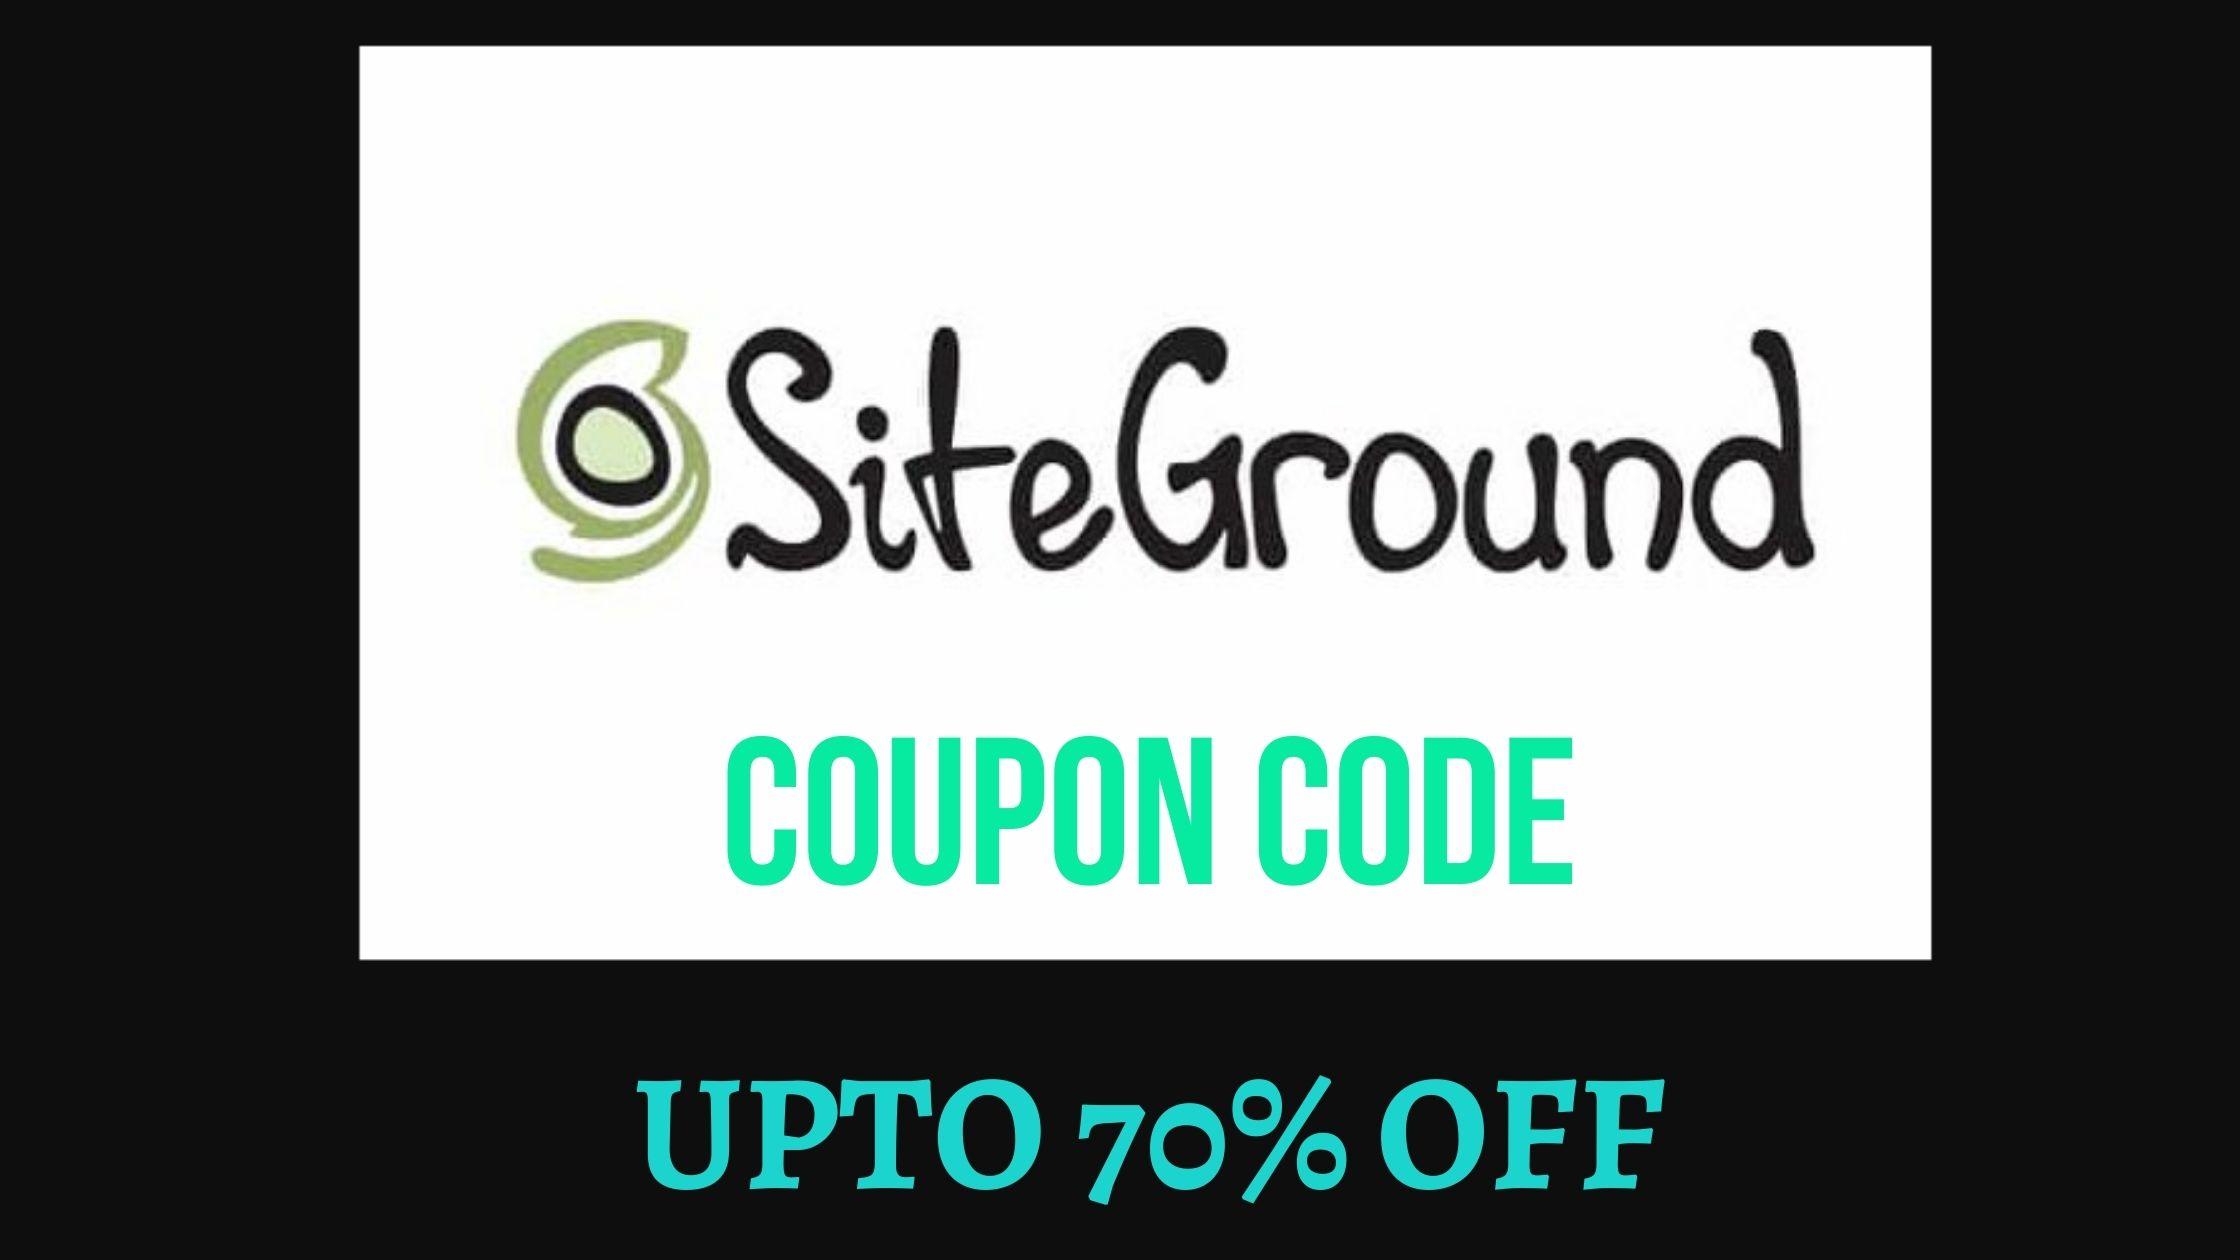 siteground coupon, siteground discount code, siteground coupon code